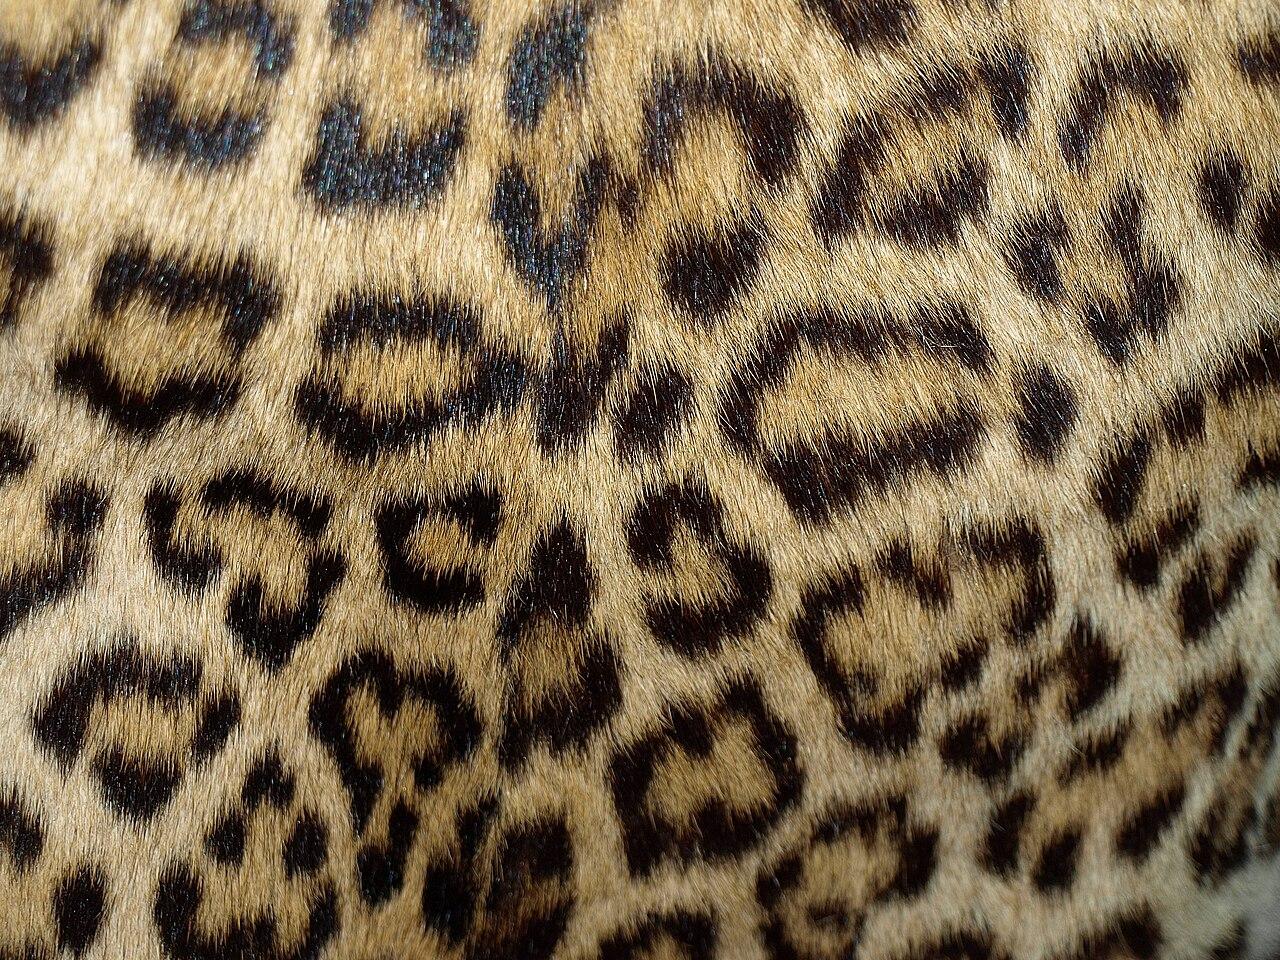 Cheetah Print High Heels Shoes